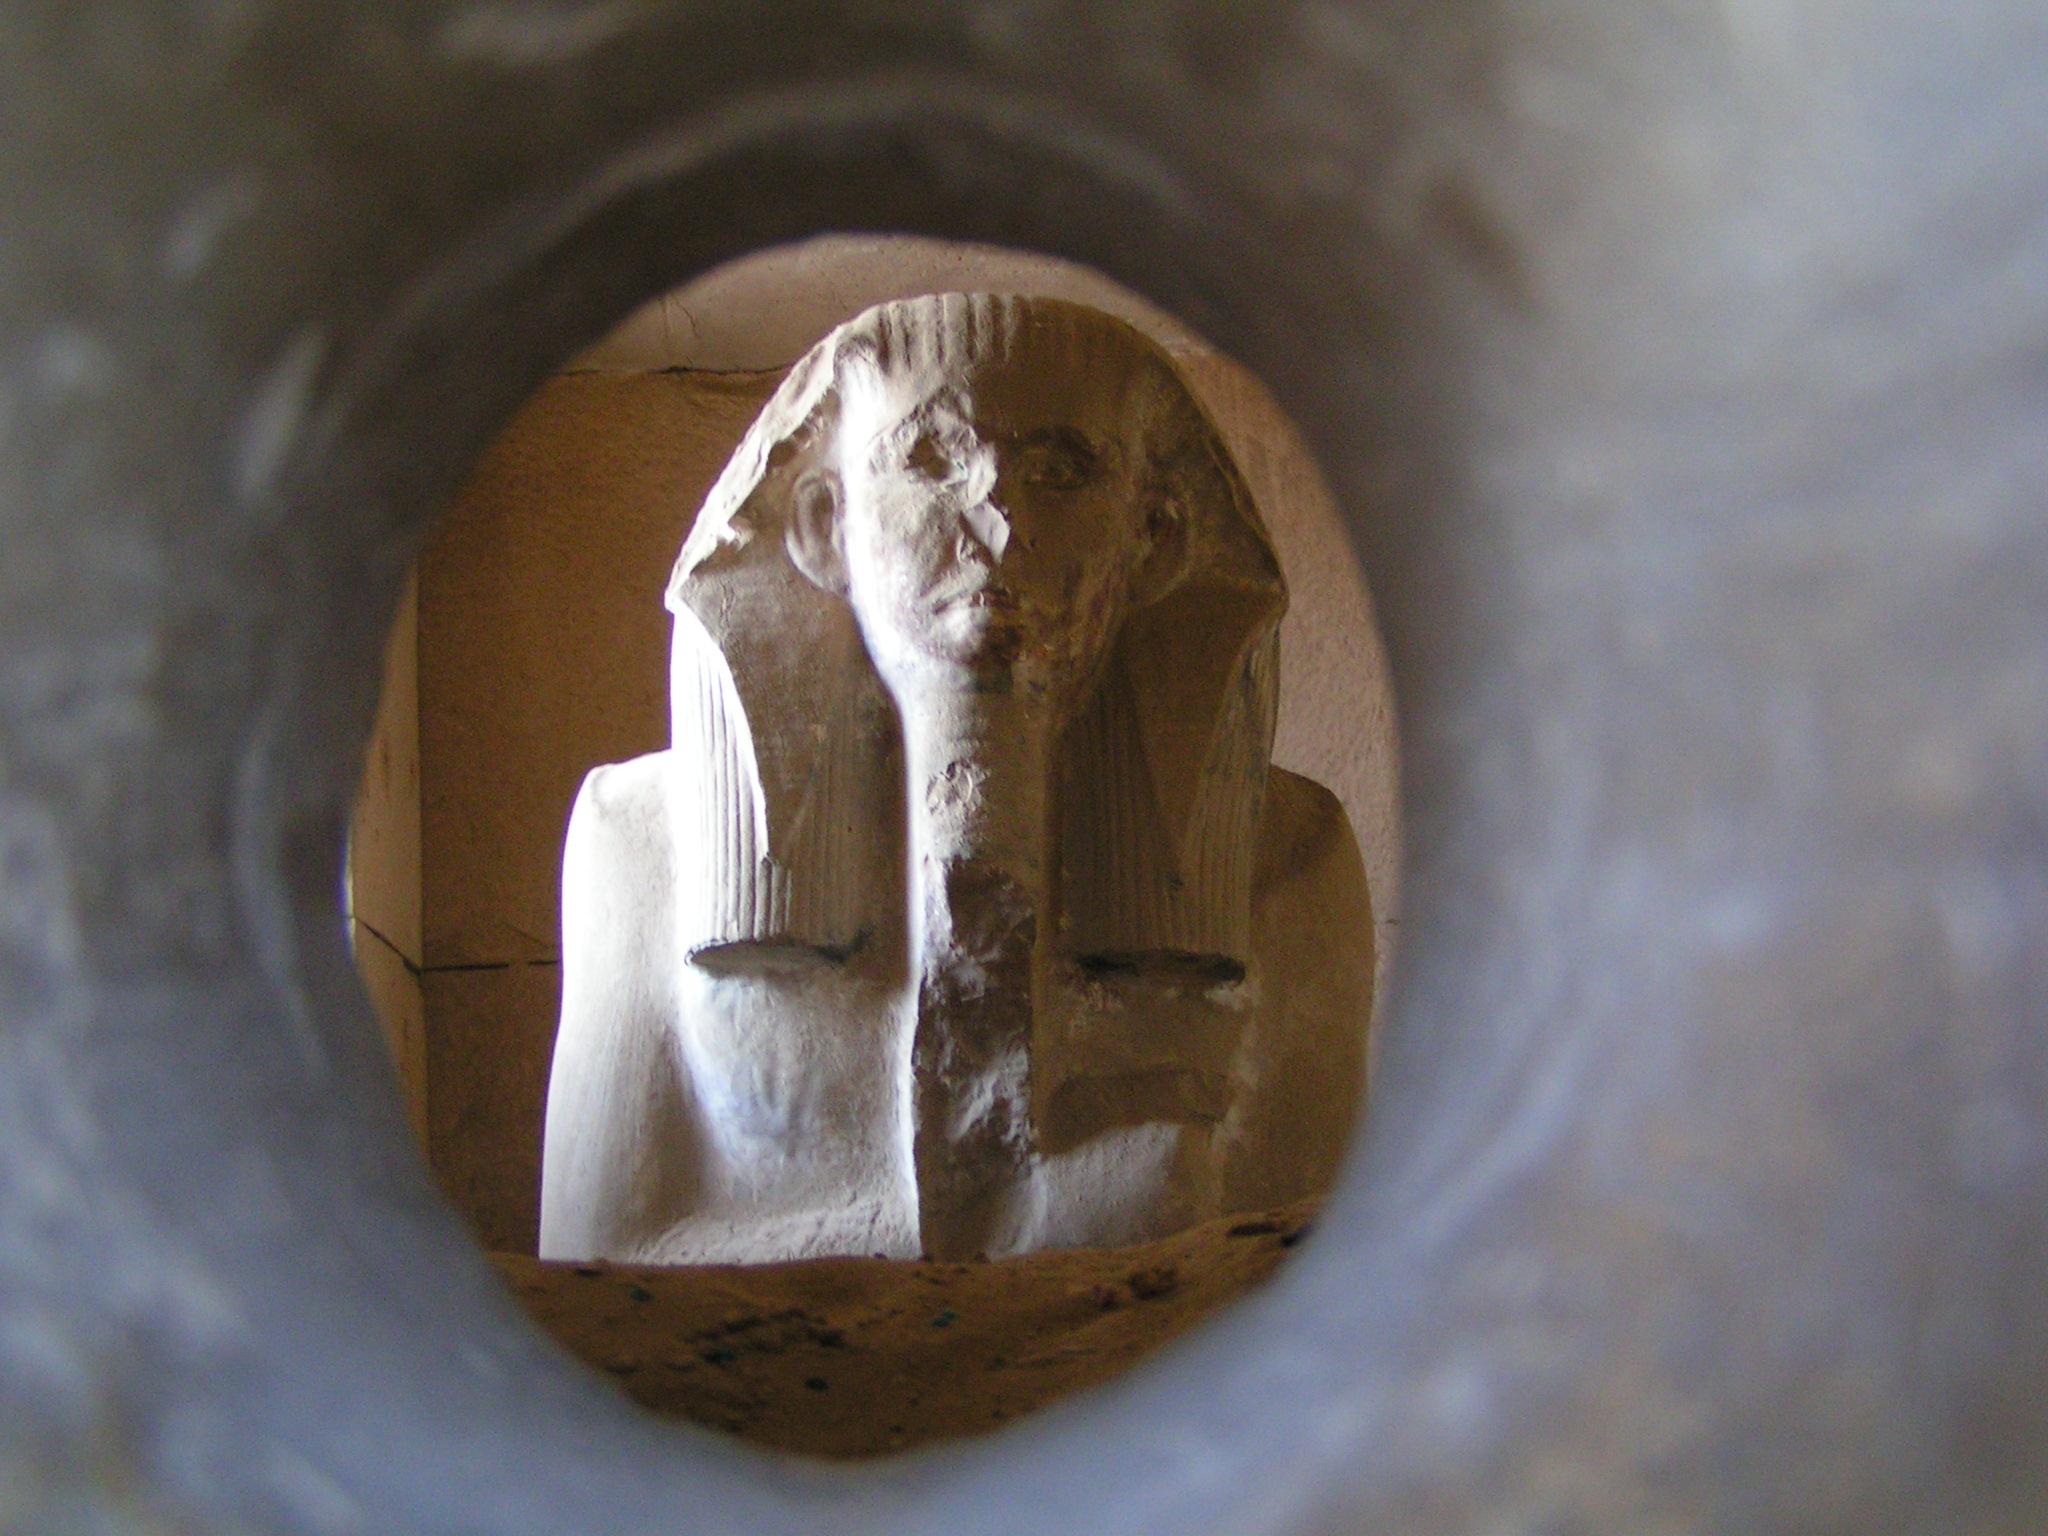 588_aegypten Saqqara 02 01 04.JPG